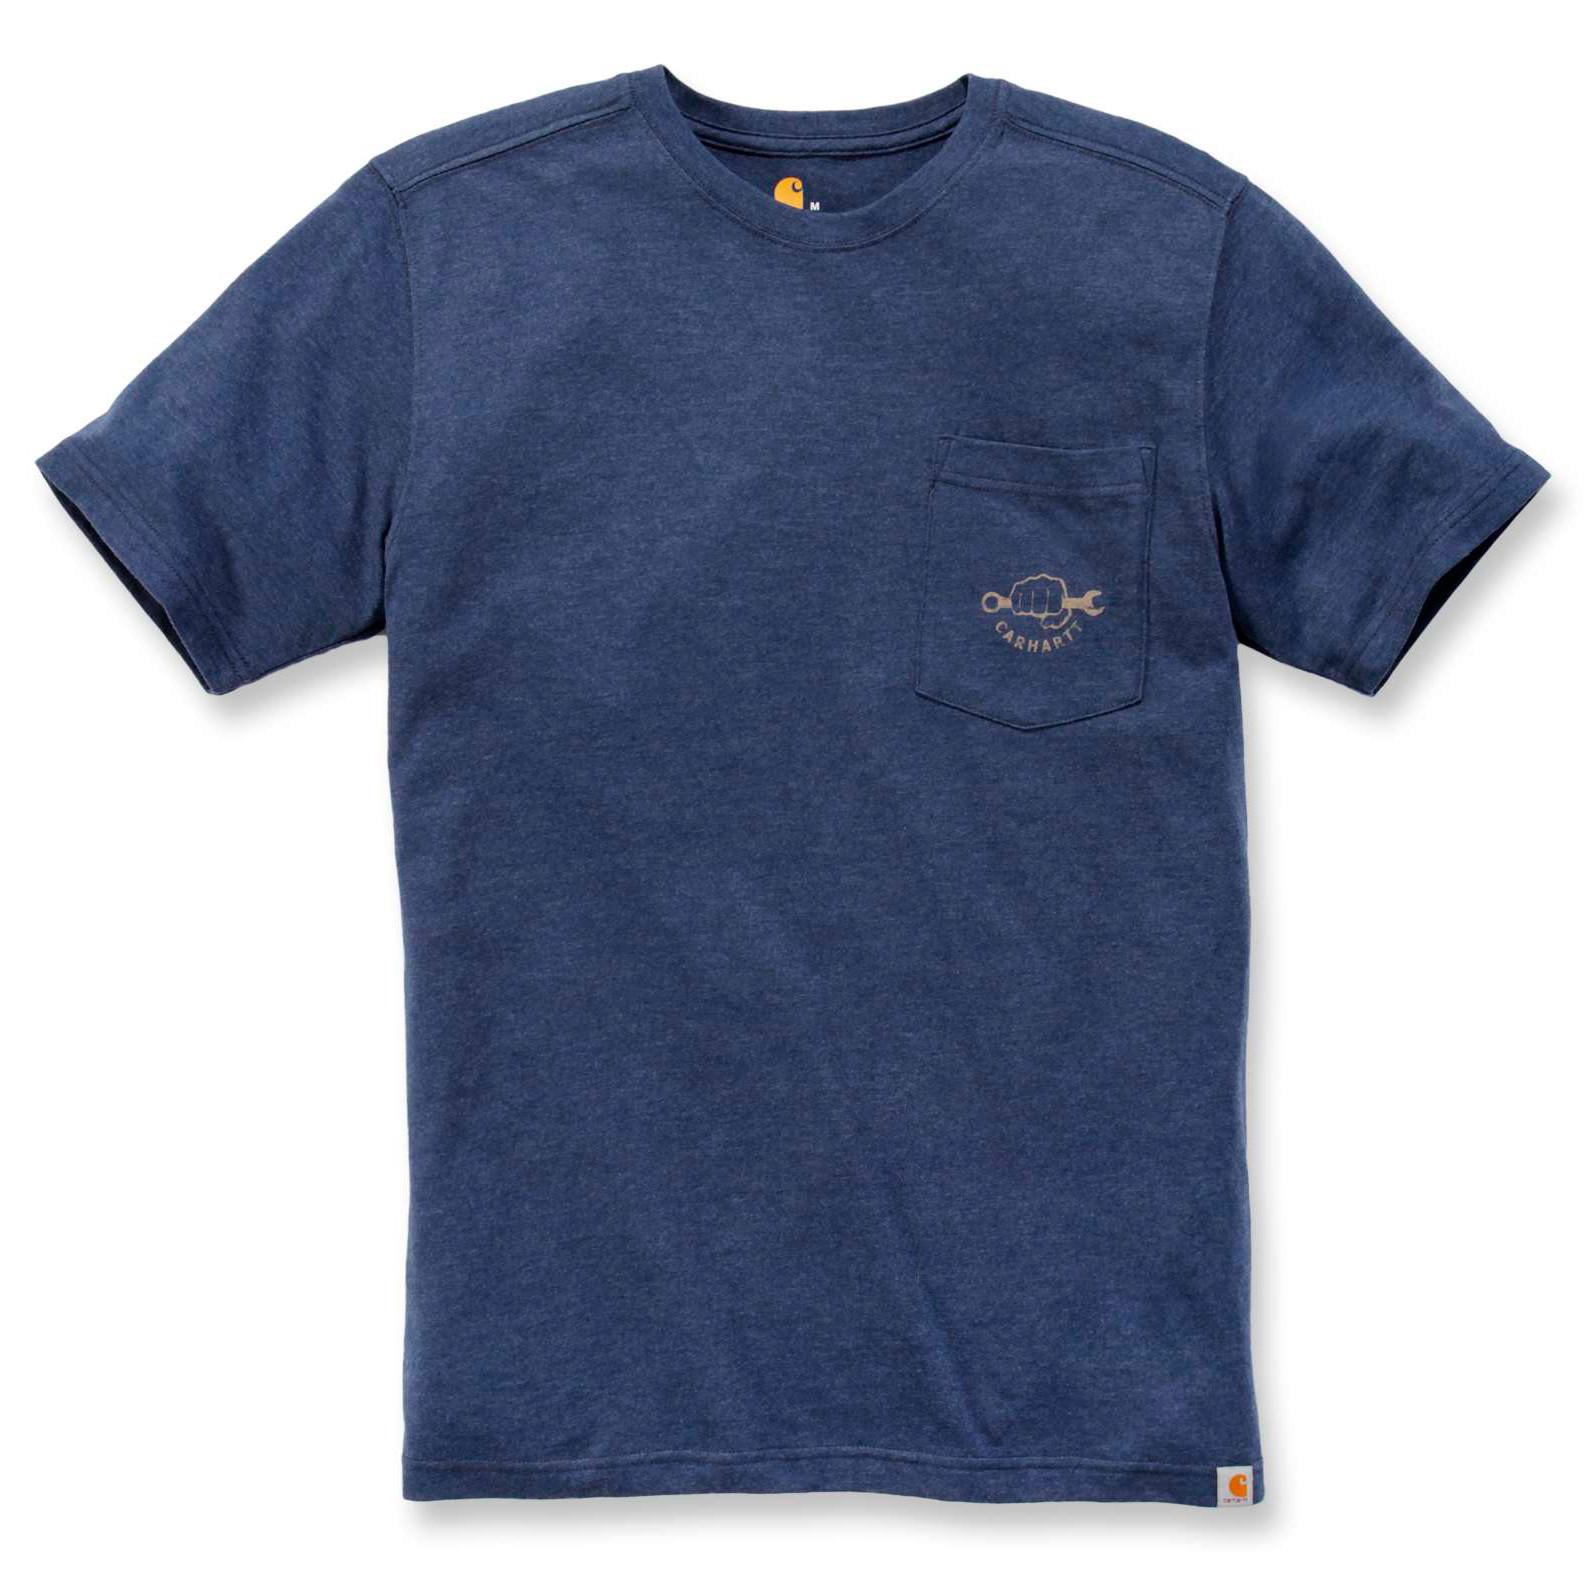 Футболка Carhartt Maddock Strong Graphic S/S T-Shirt - 103565 (Indigo Heather)